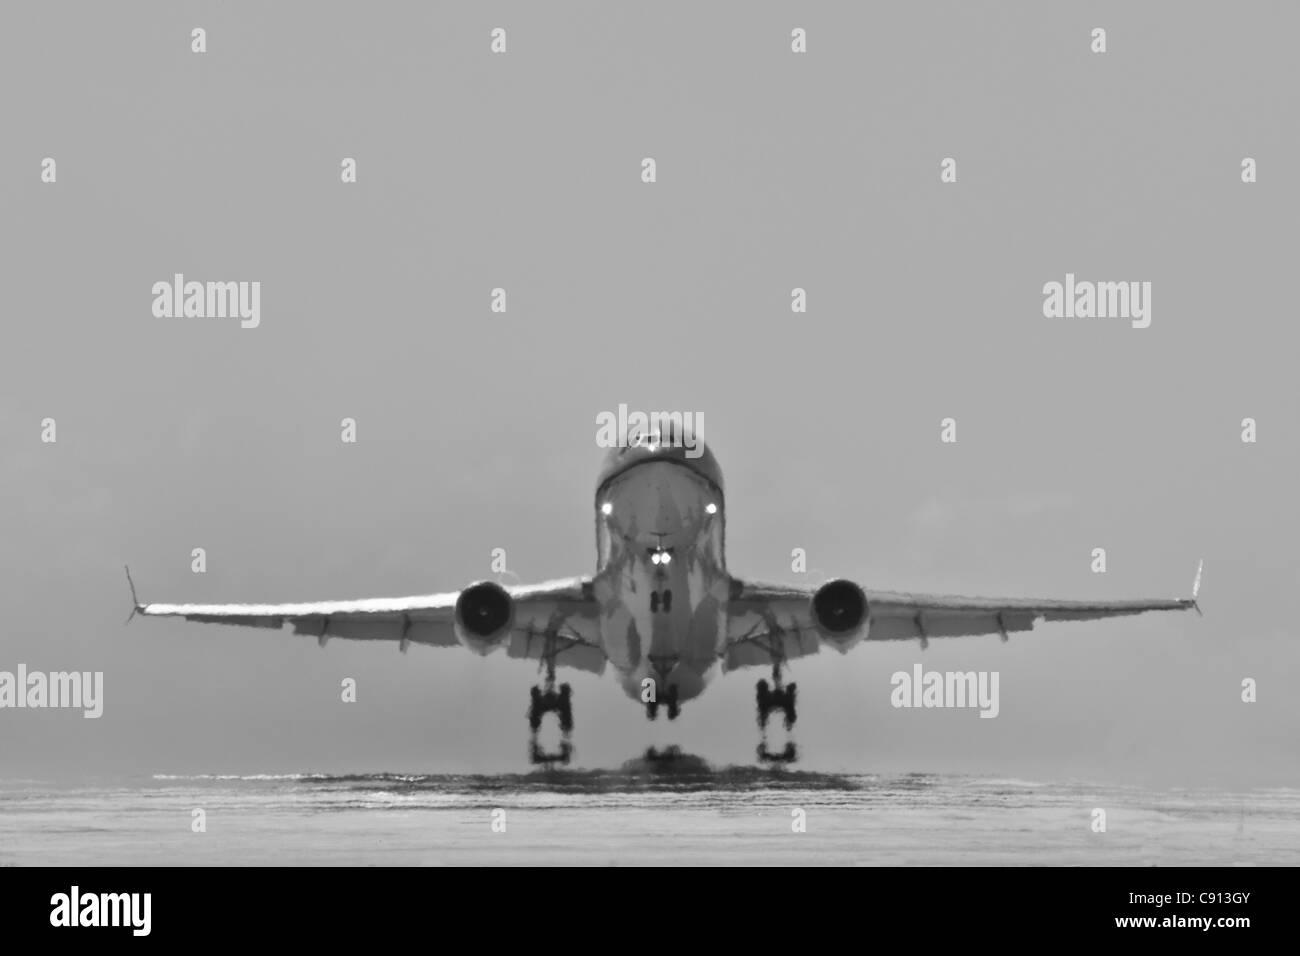 Bonaire Island, olandese dei Caraibi, Kralendijk, KLM Douglas DC-10 aereo, tenendo fuori dal Flamingo Airport. In Immagini Stock